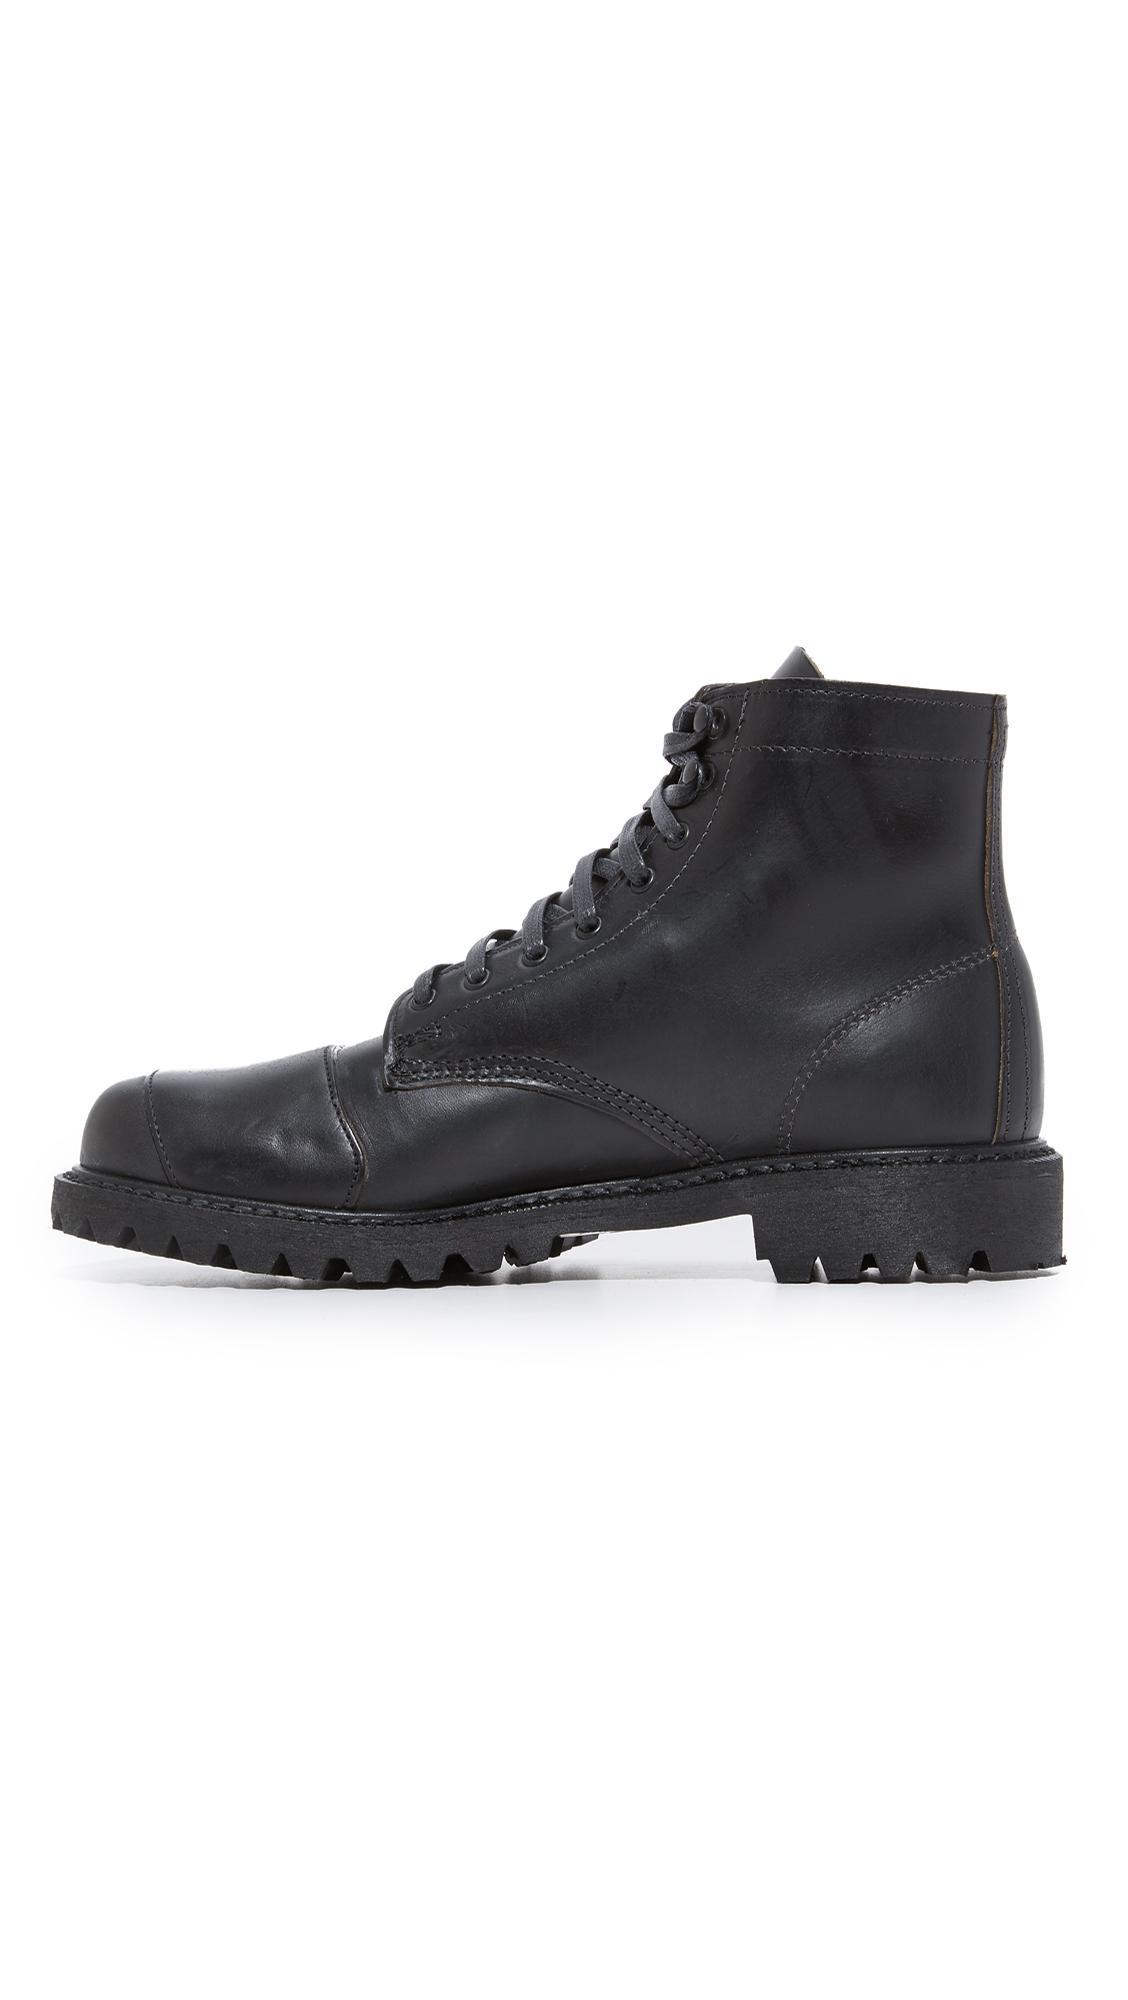 ae8de7474d3 Wolverine Dylan Moto Boots in Black for Men - Lyst